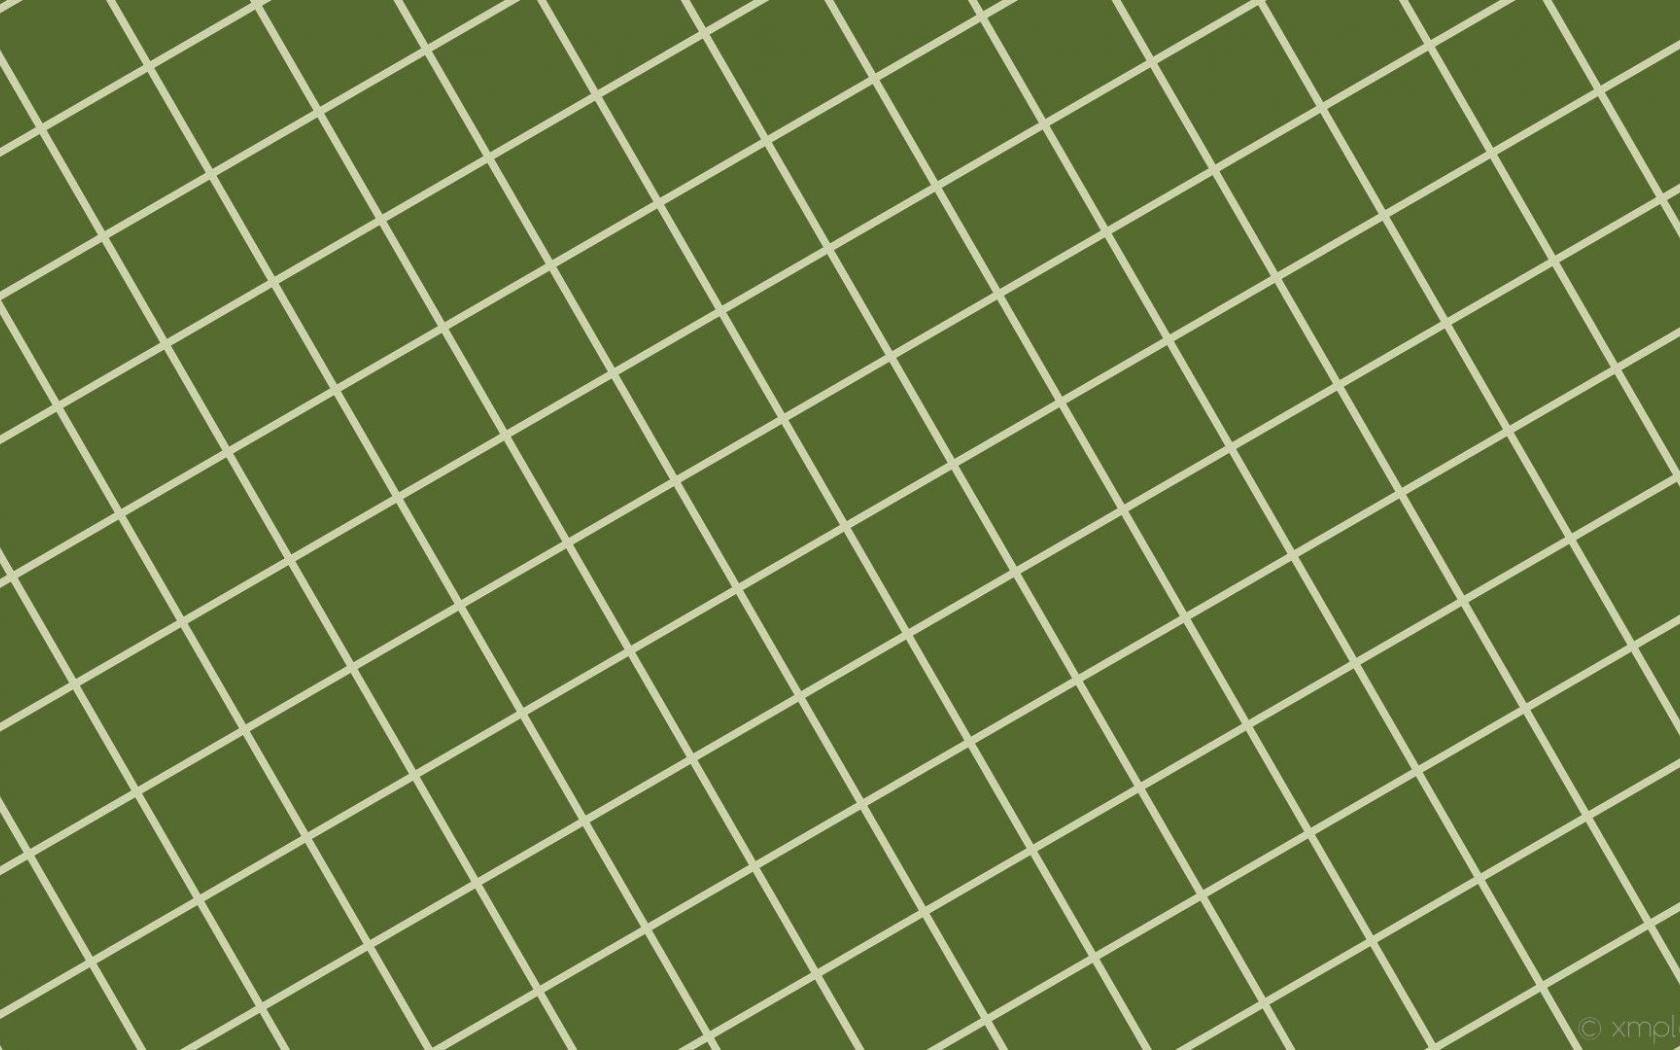 Free Download Olive Greenaesthetic Desktop Wallpapers Top Olive